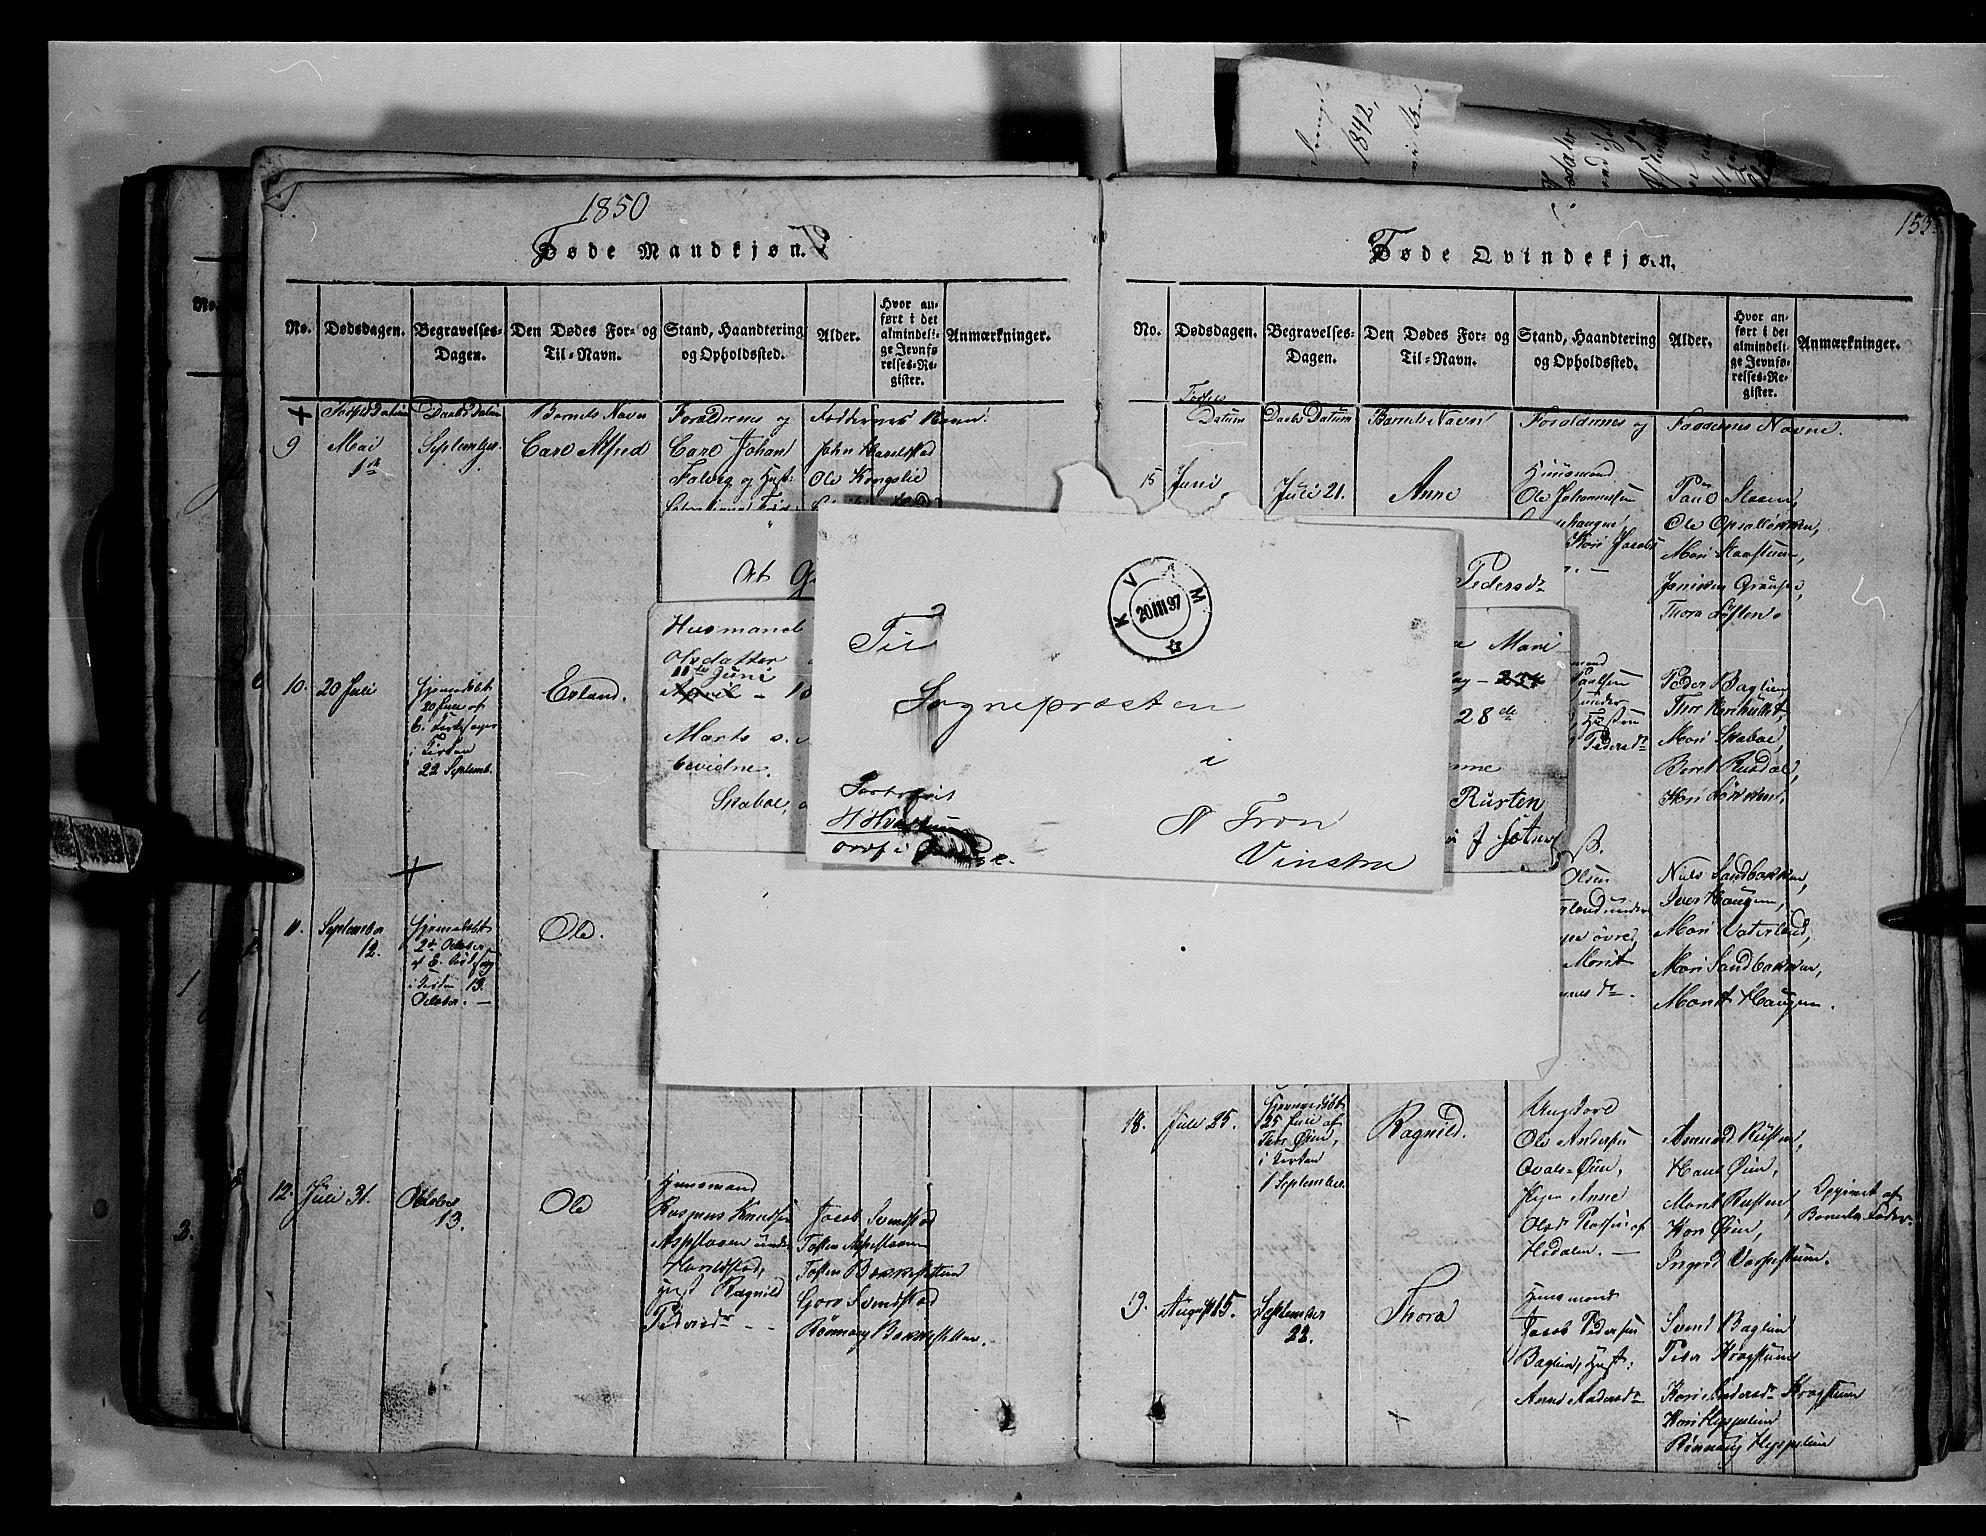 SAH, Fron prestekontor, H/Ha/Hab/L0003: Klokkerbok nr. 3, 1816-1850, s. 153